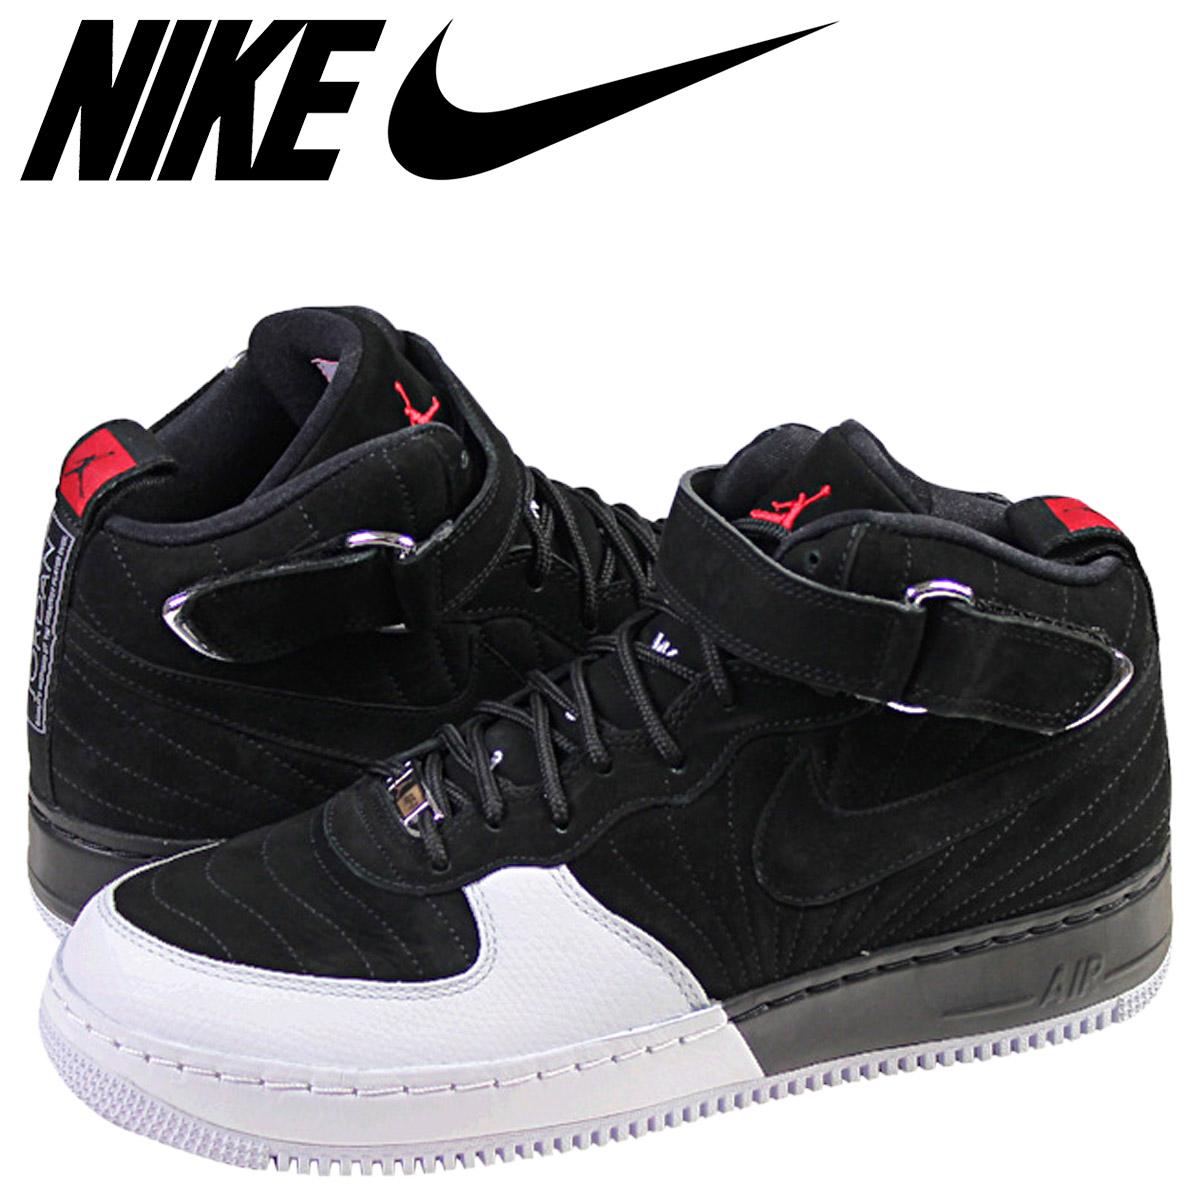 buy online 35a87 e9ed8 Nike NIKE Air Jordan sneakers AIR JORDAN FUSION 12 Air Jordan fusion 12  317742-061 ...